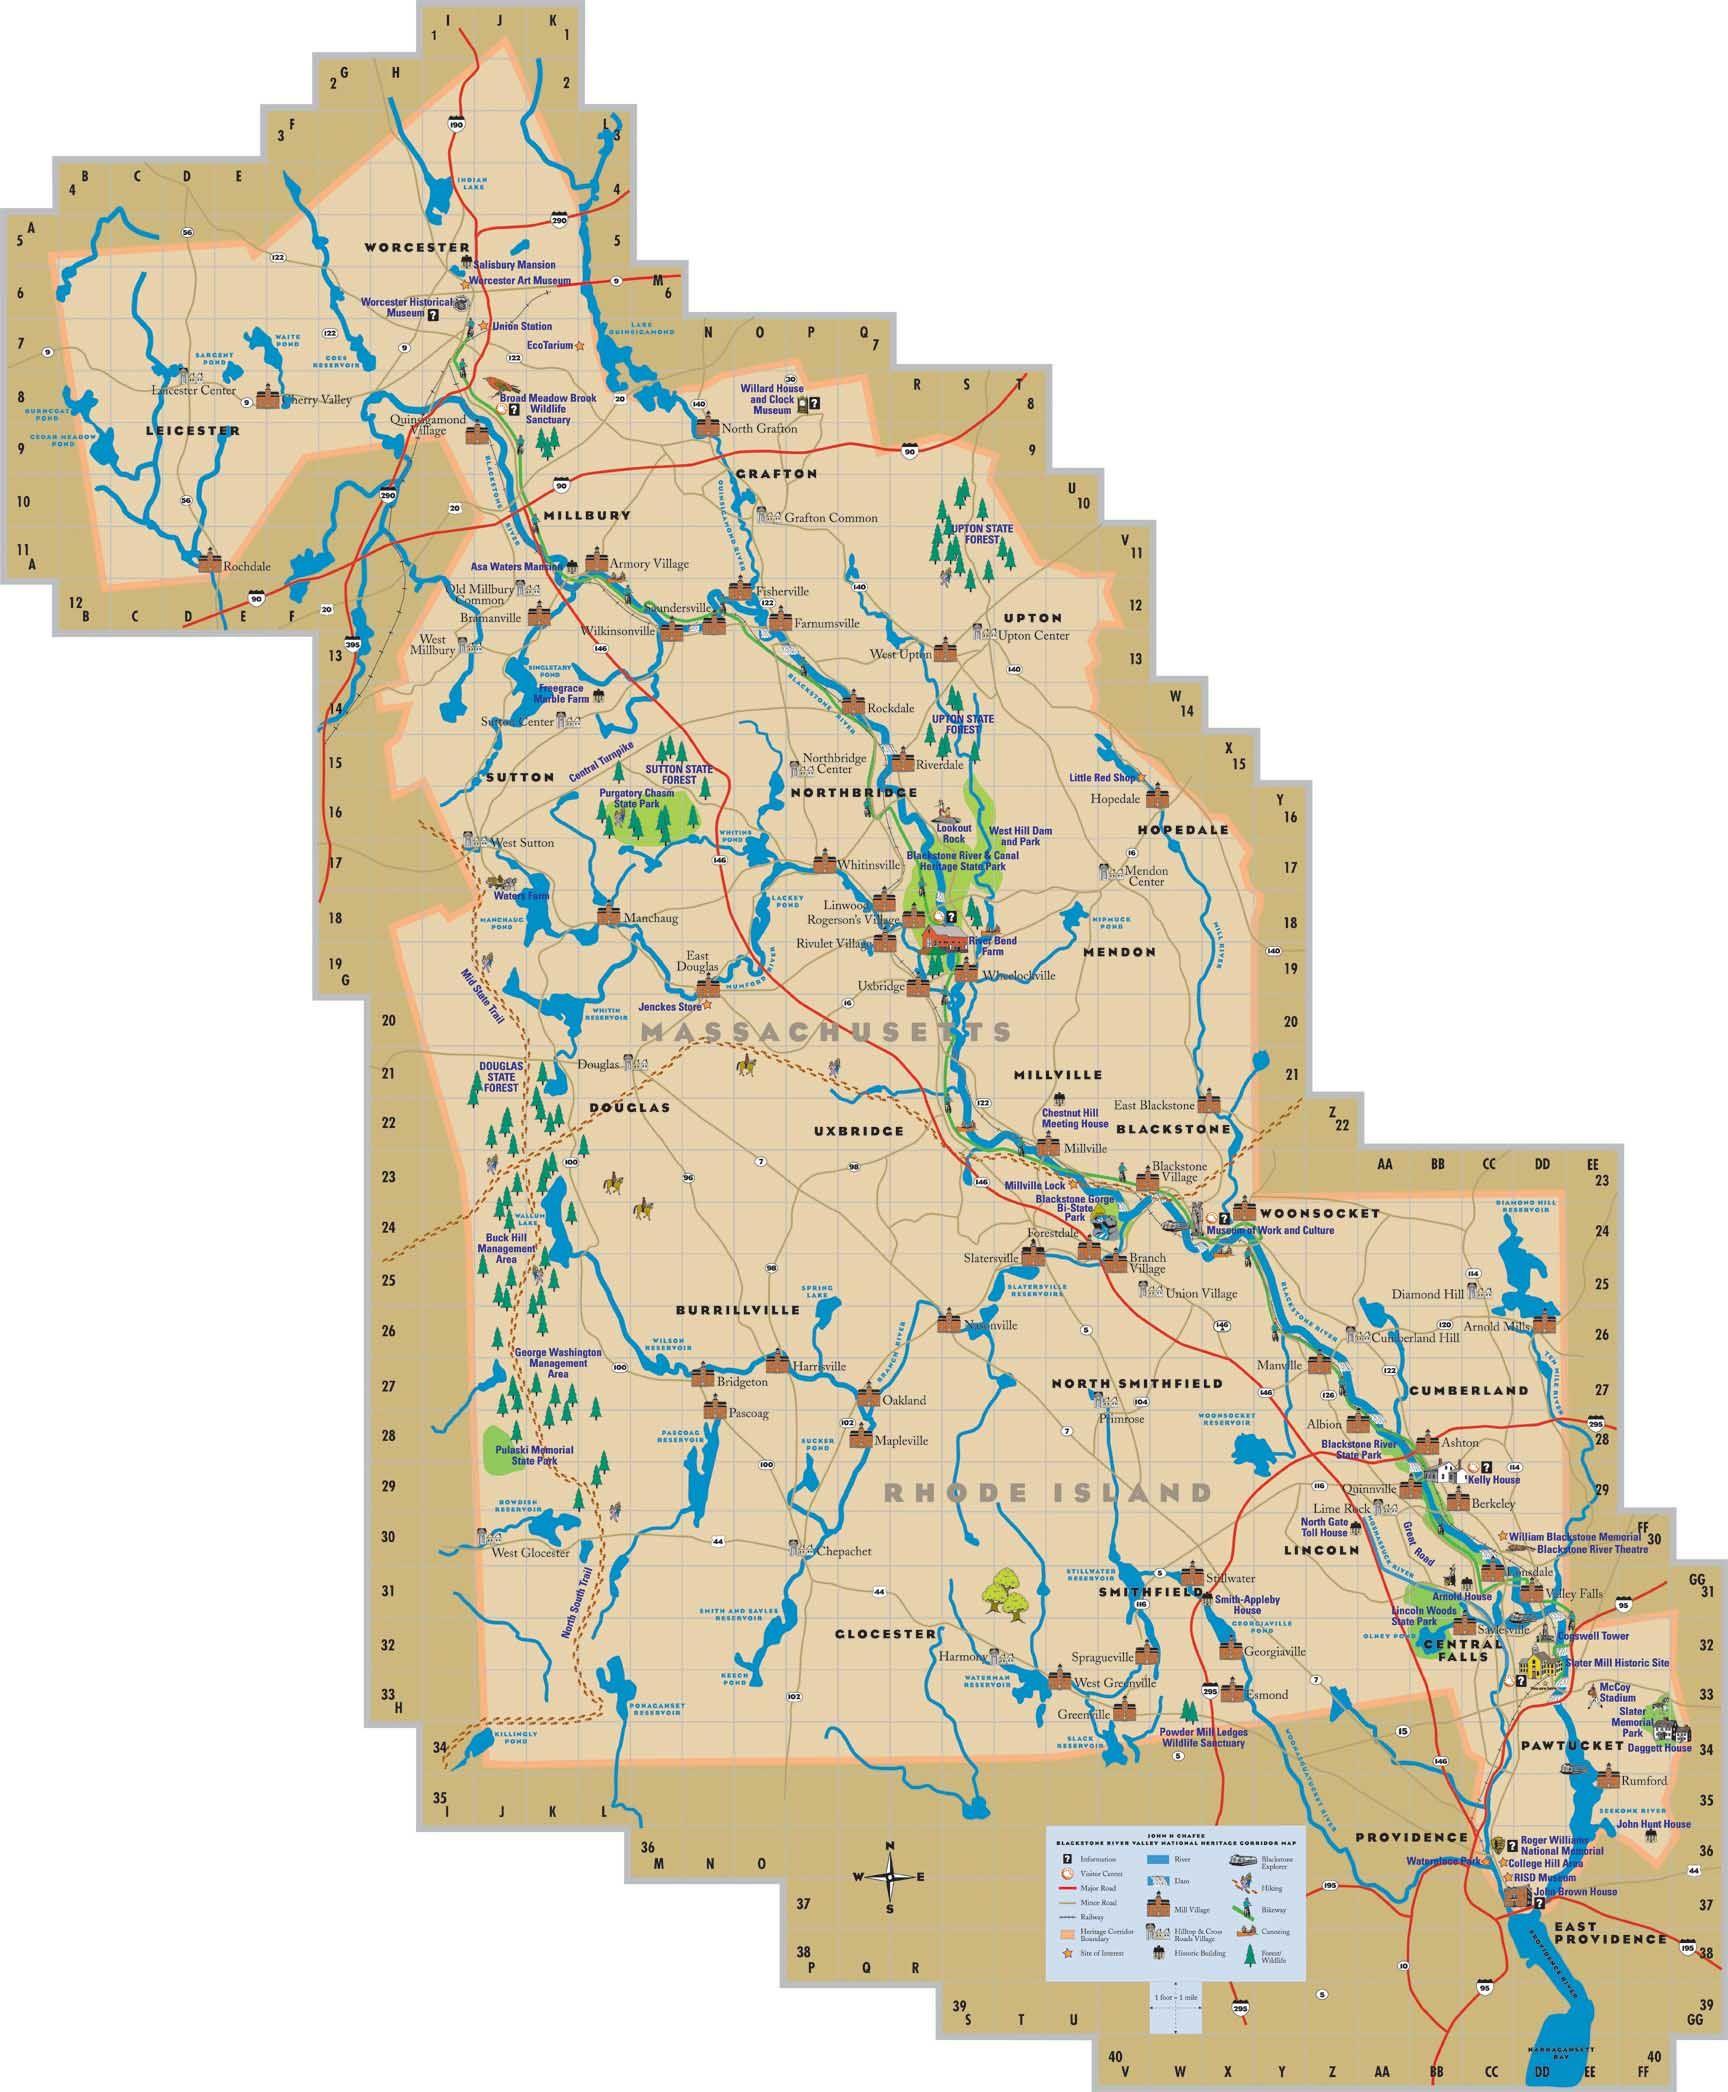 Blackstone Valley Tourist Map Tourist Map Tourist Blackstone